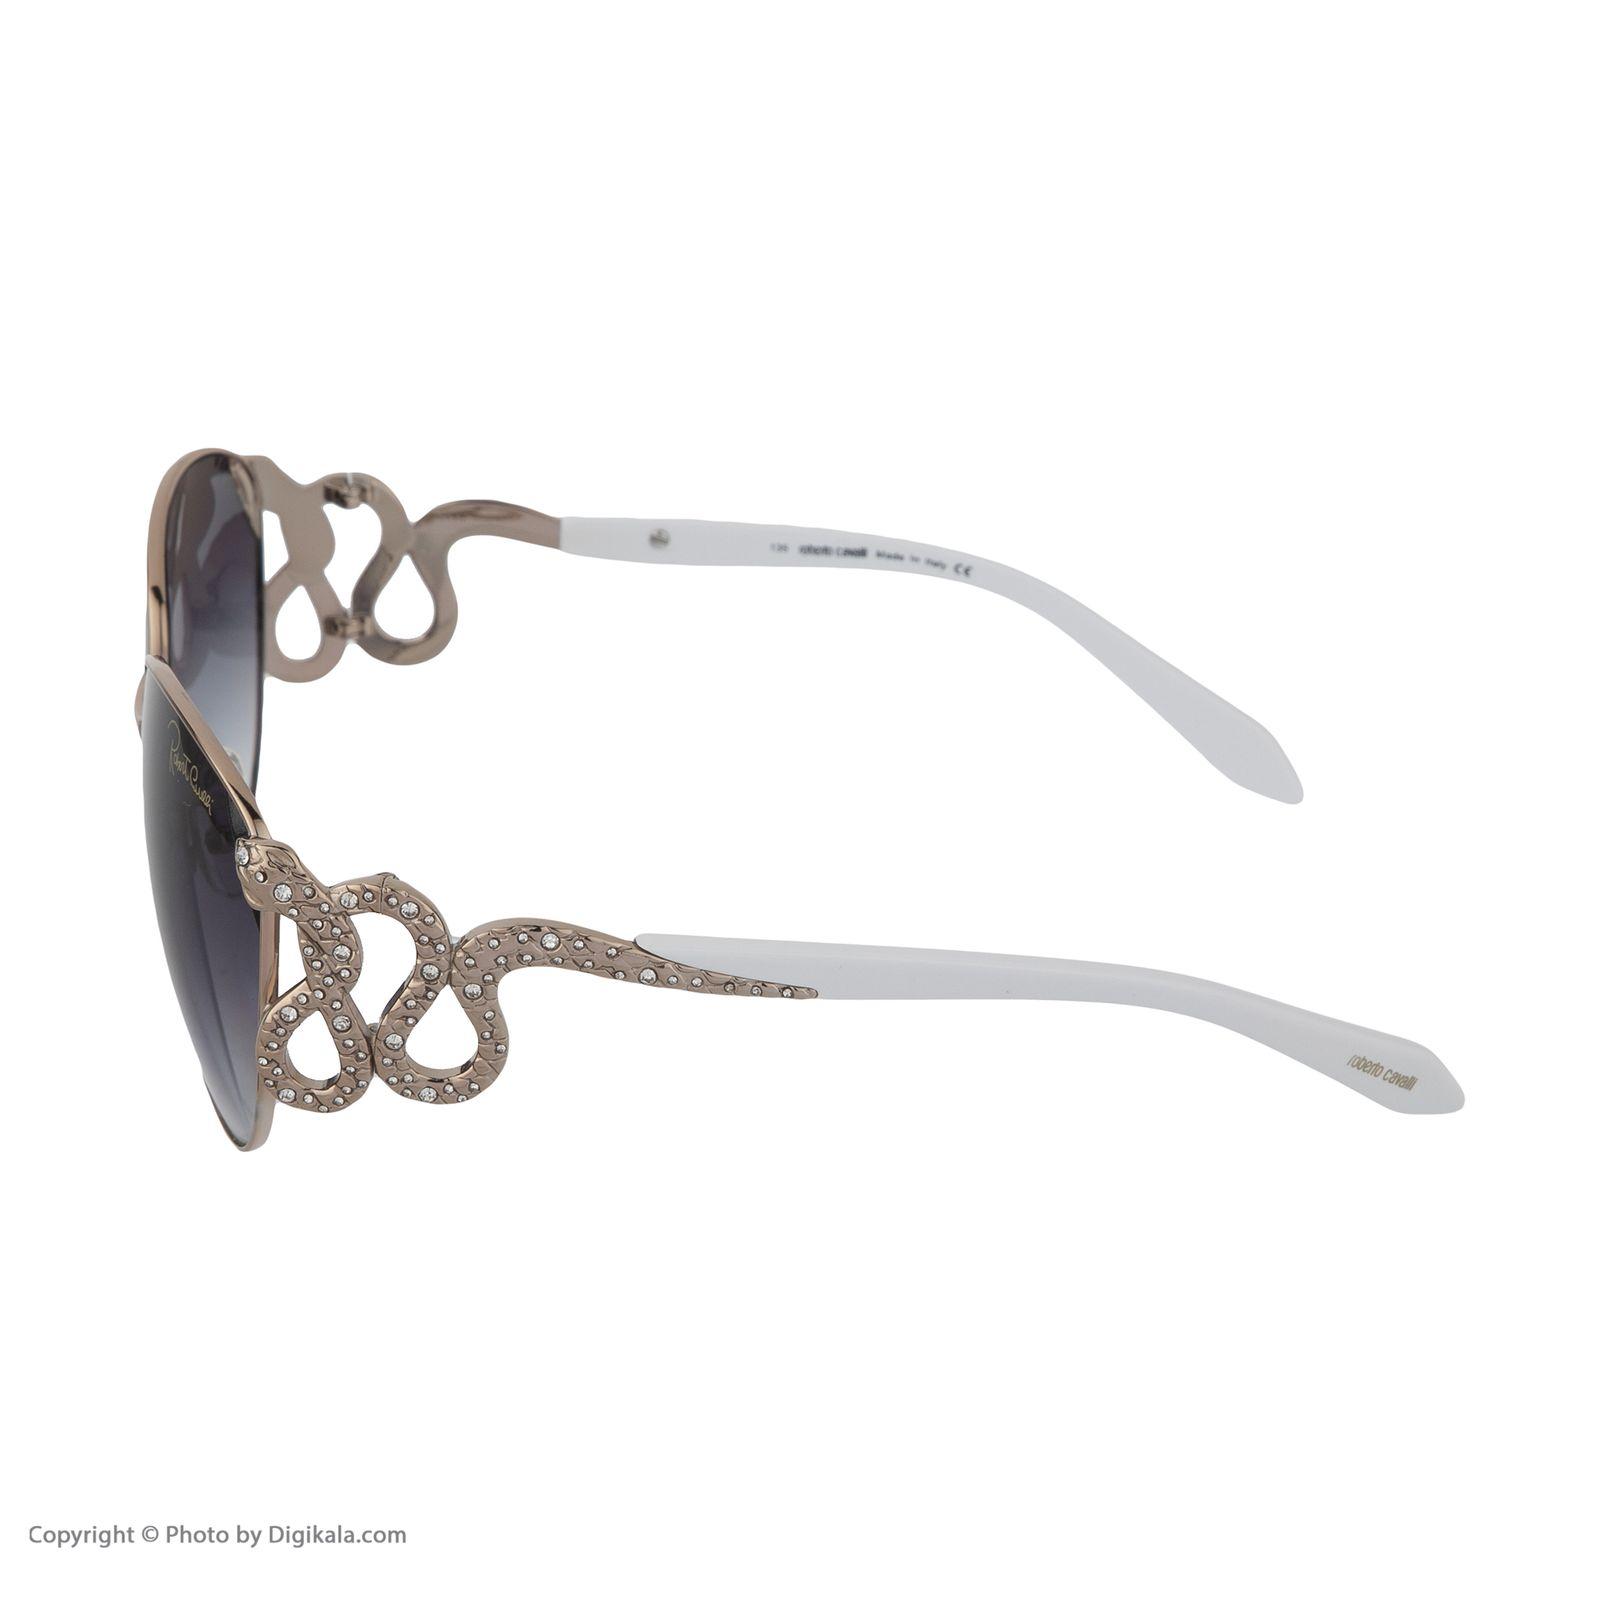 عینک آفتابی زنانه روبرتو کاوالی مدل 897 -  - 5